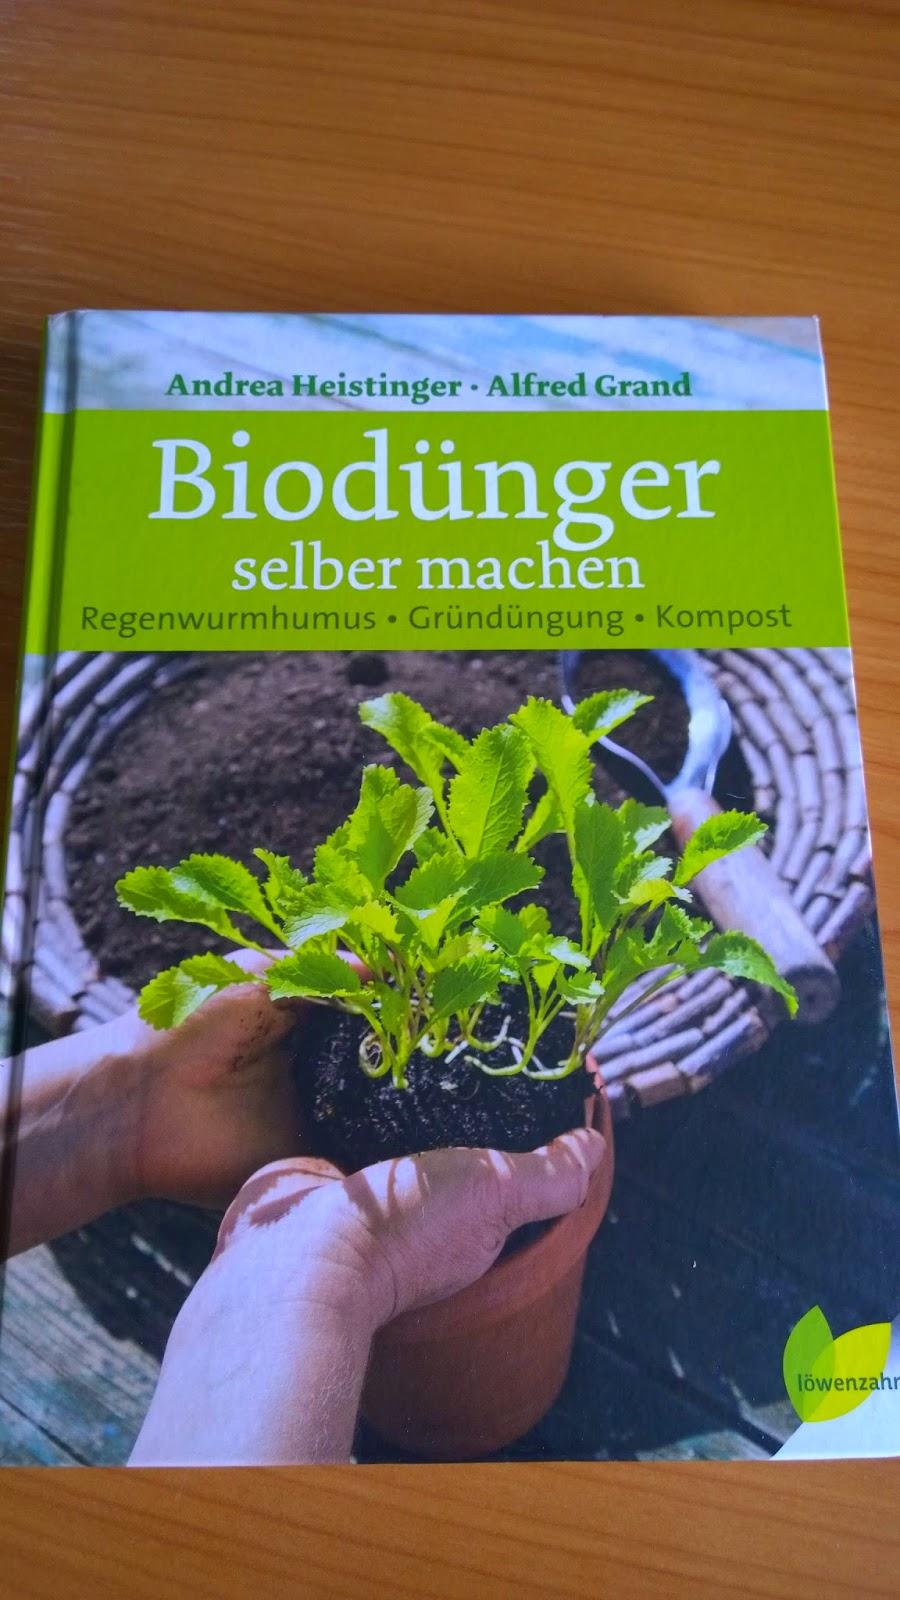 Biodünger selber machen (c) by Joachim Wenk